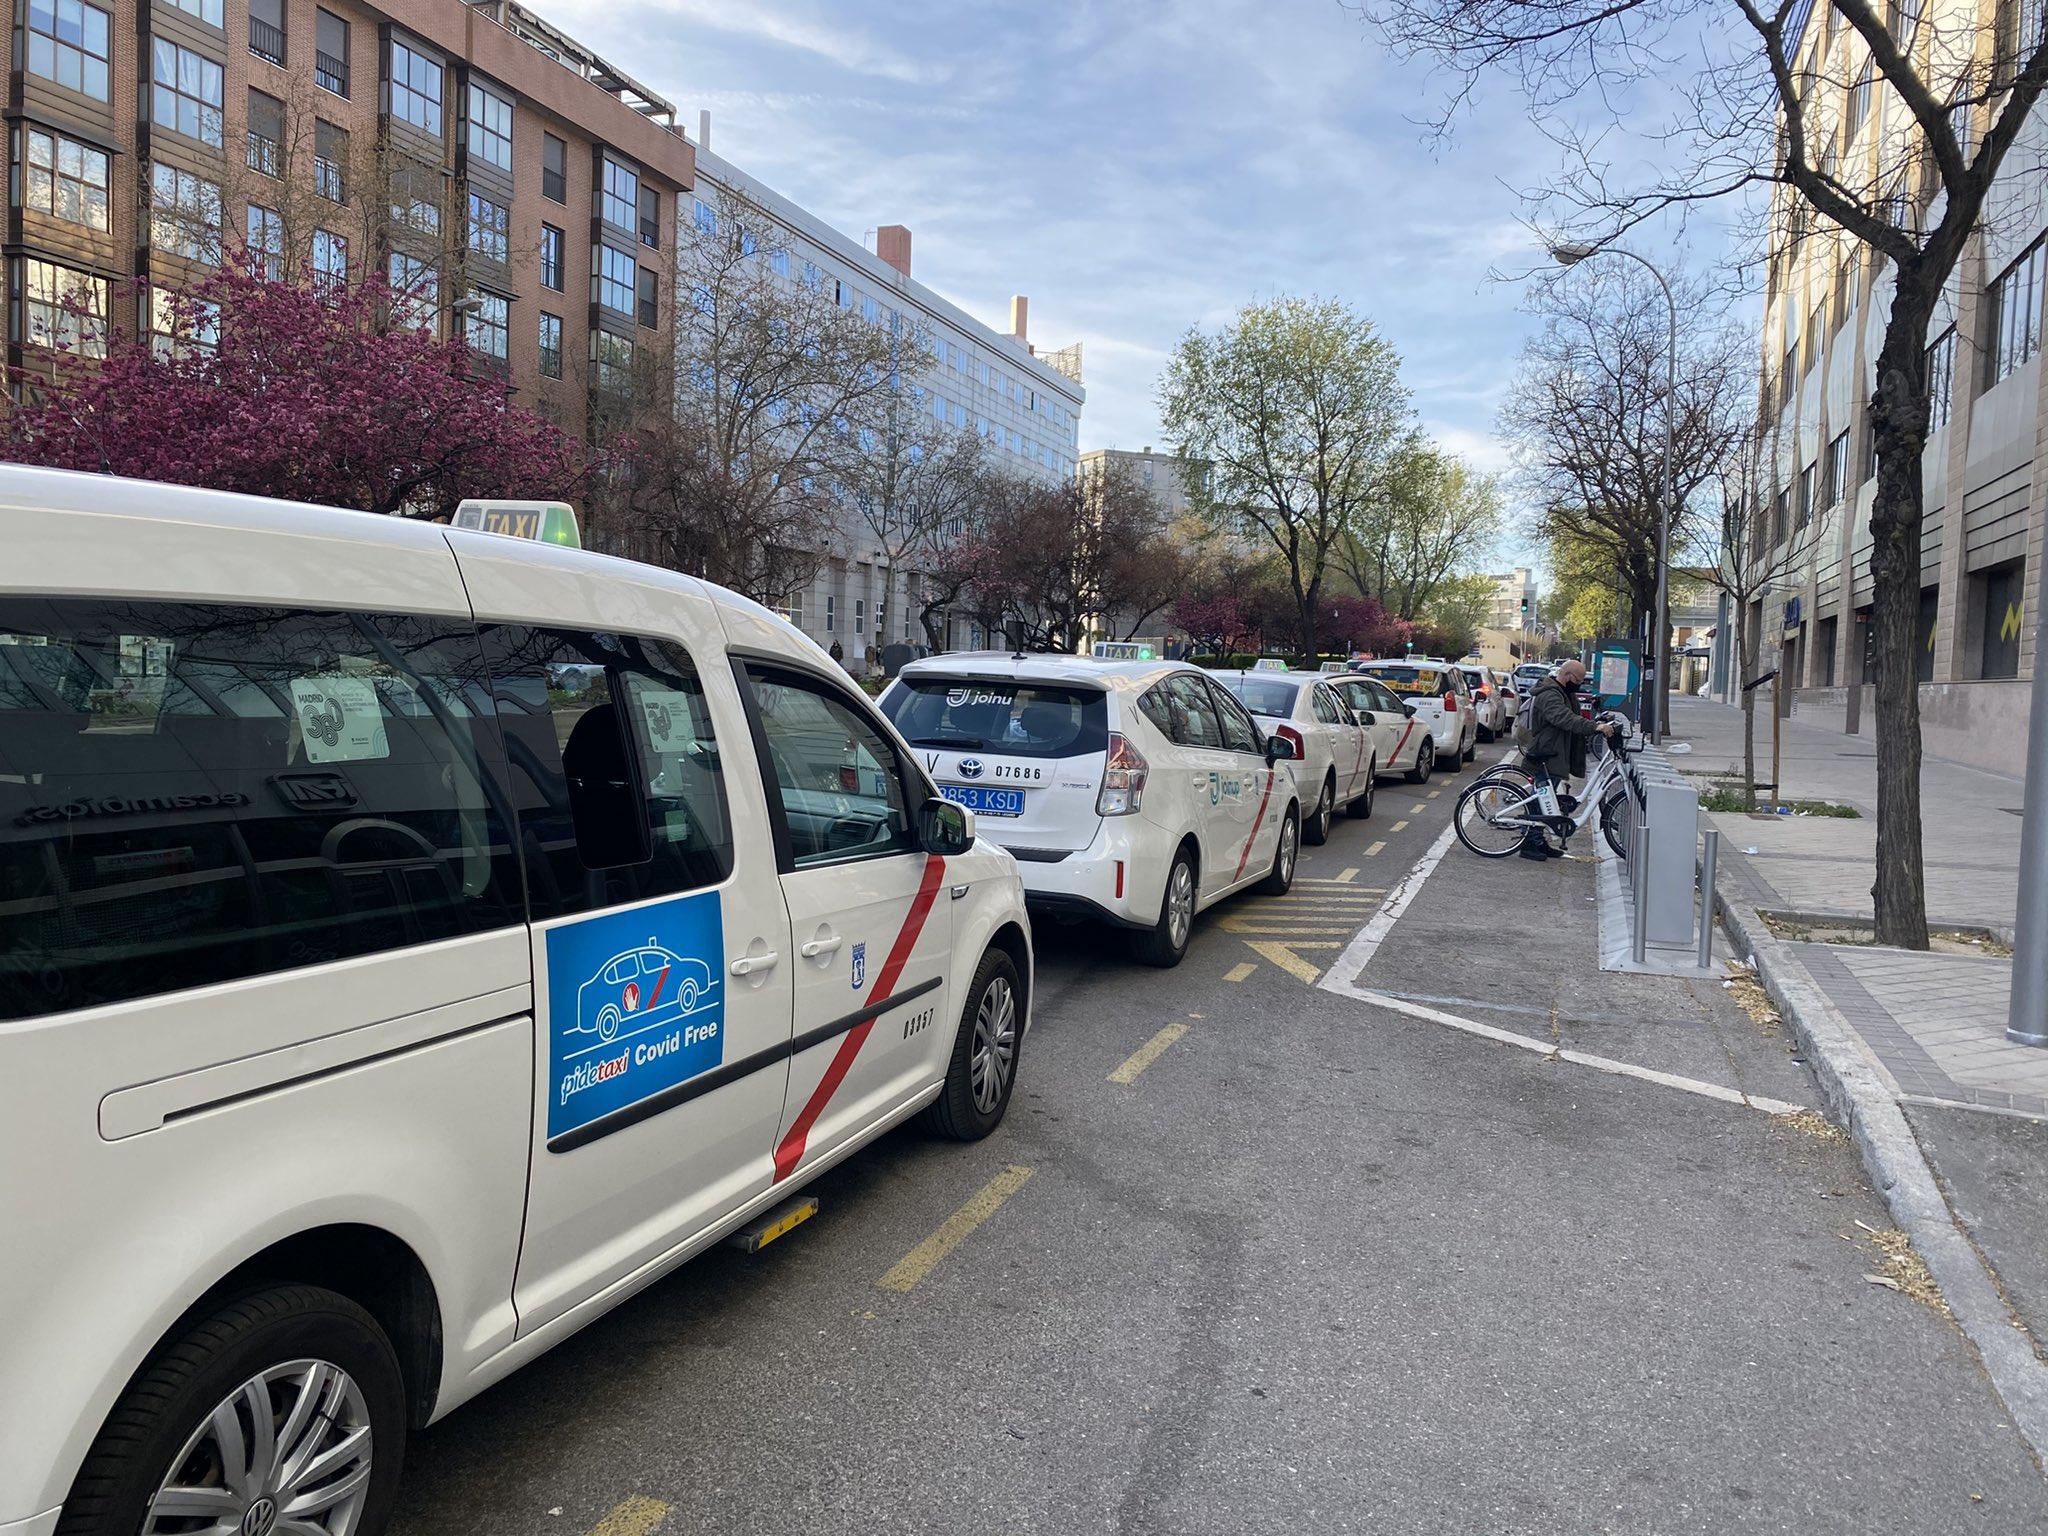 Carril bici provisional Méndez Álvaro Taxis